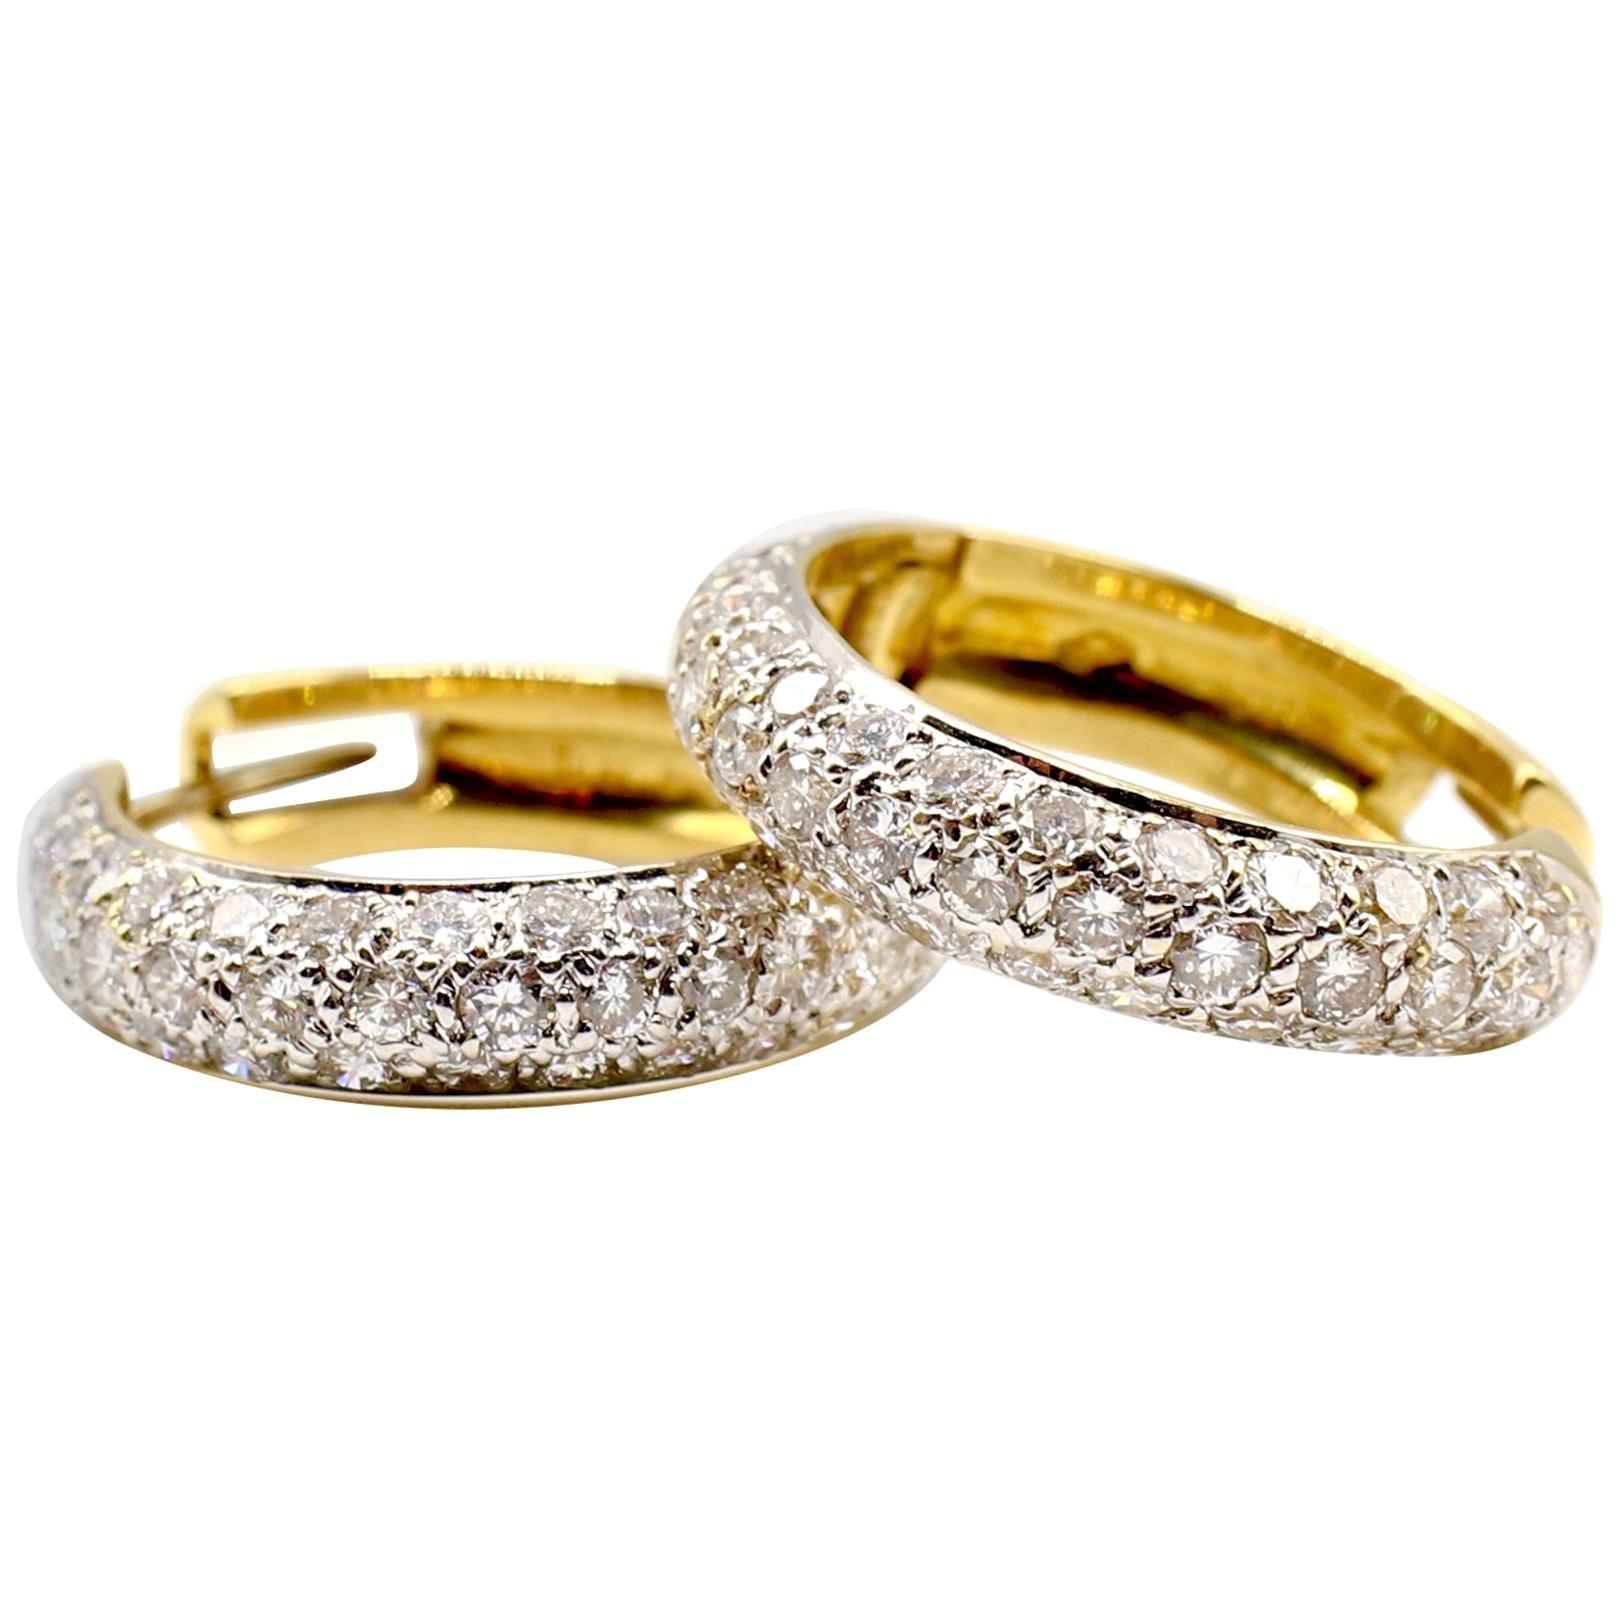 3 Carat Diamond 18 Karat Yellow Gold Hoop Drop Earrings